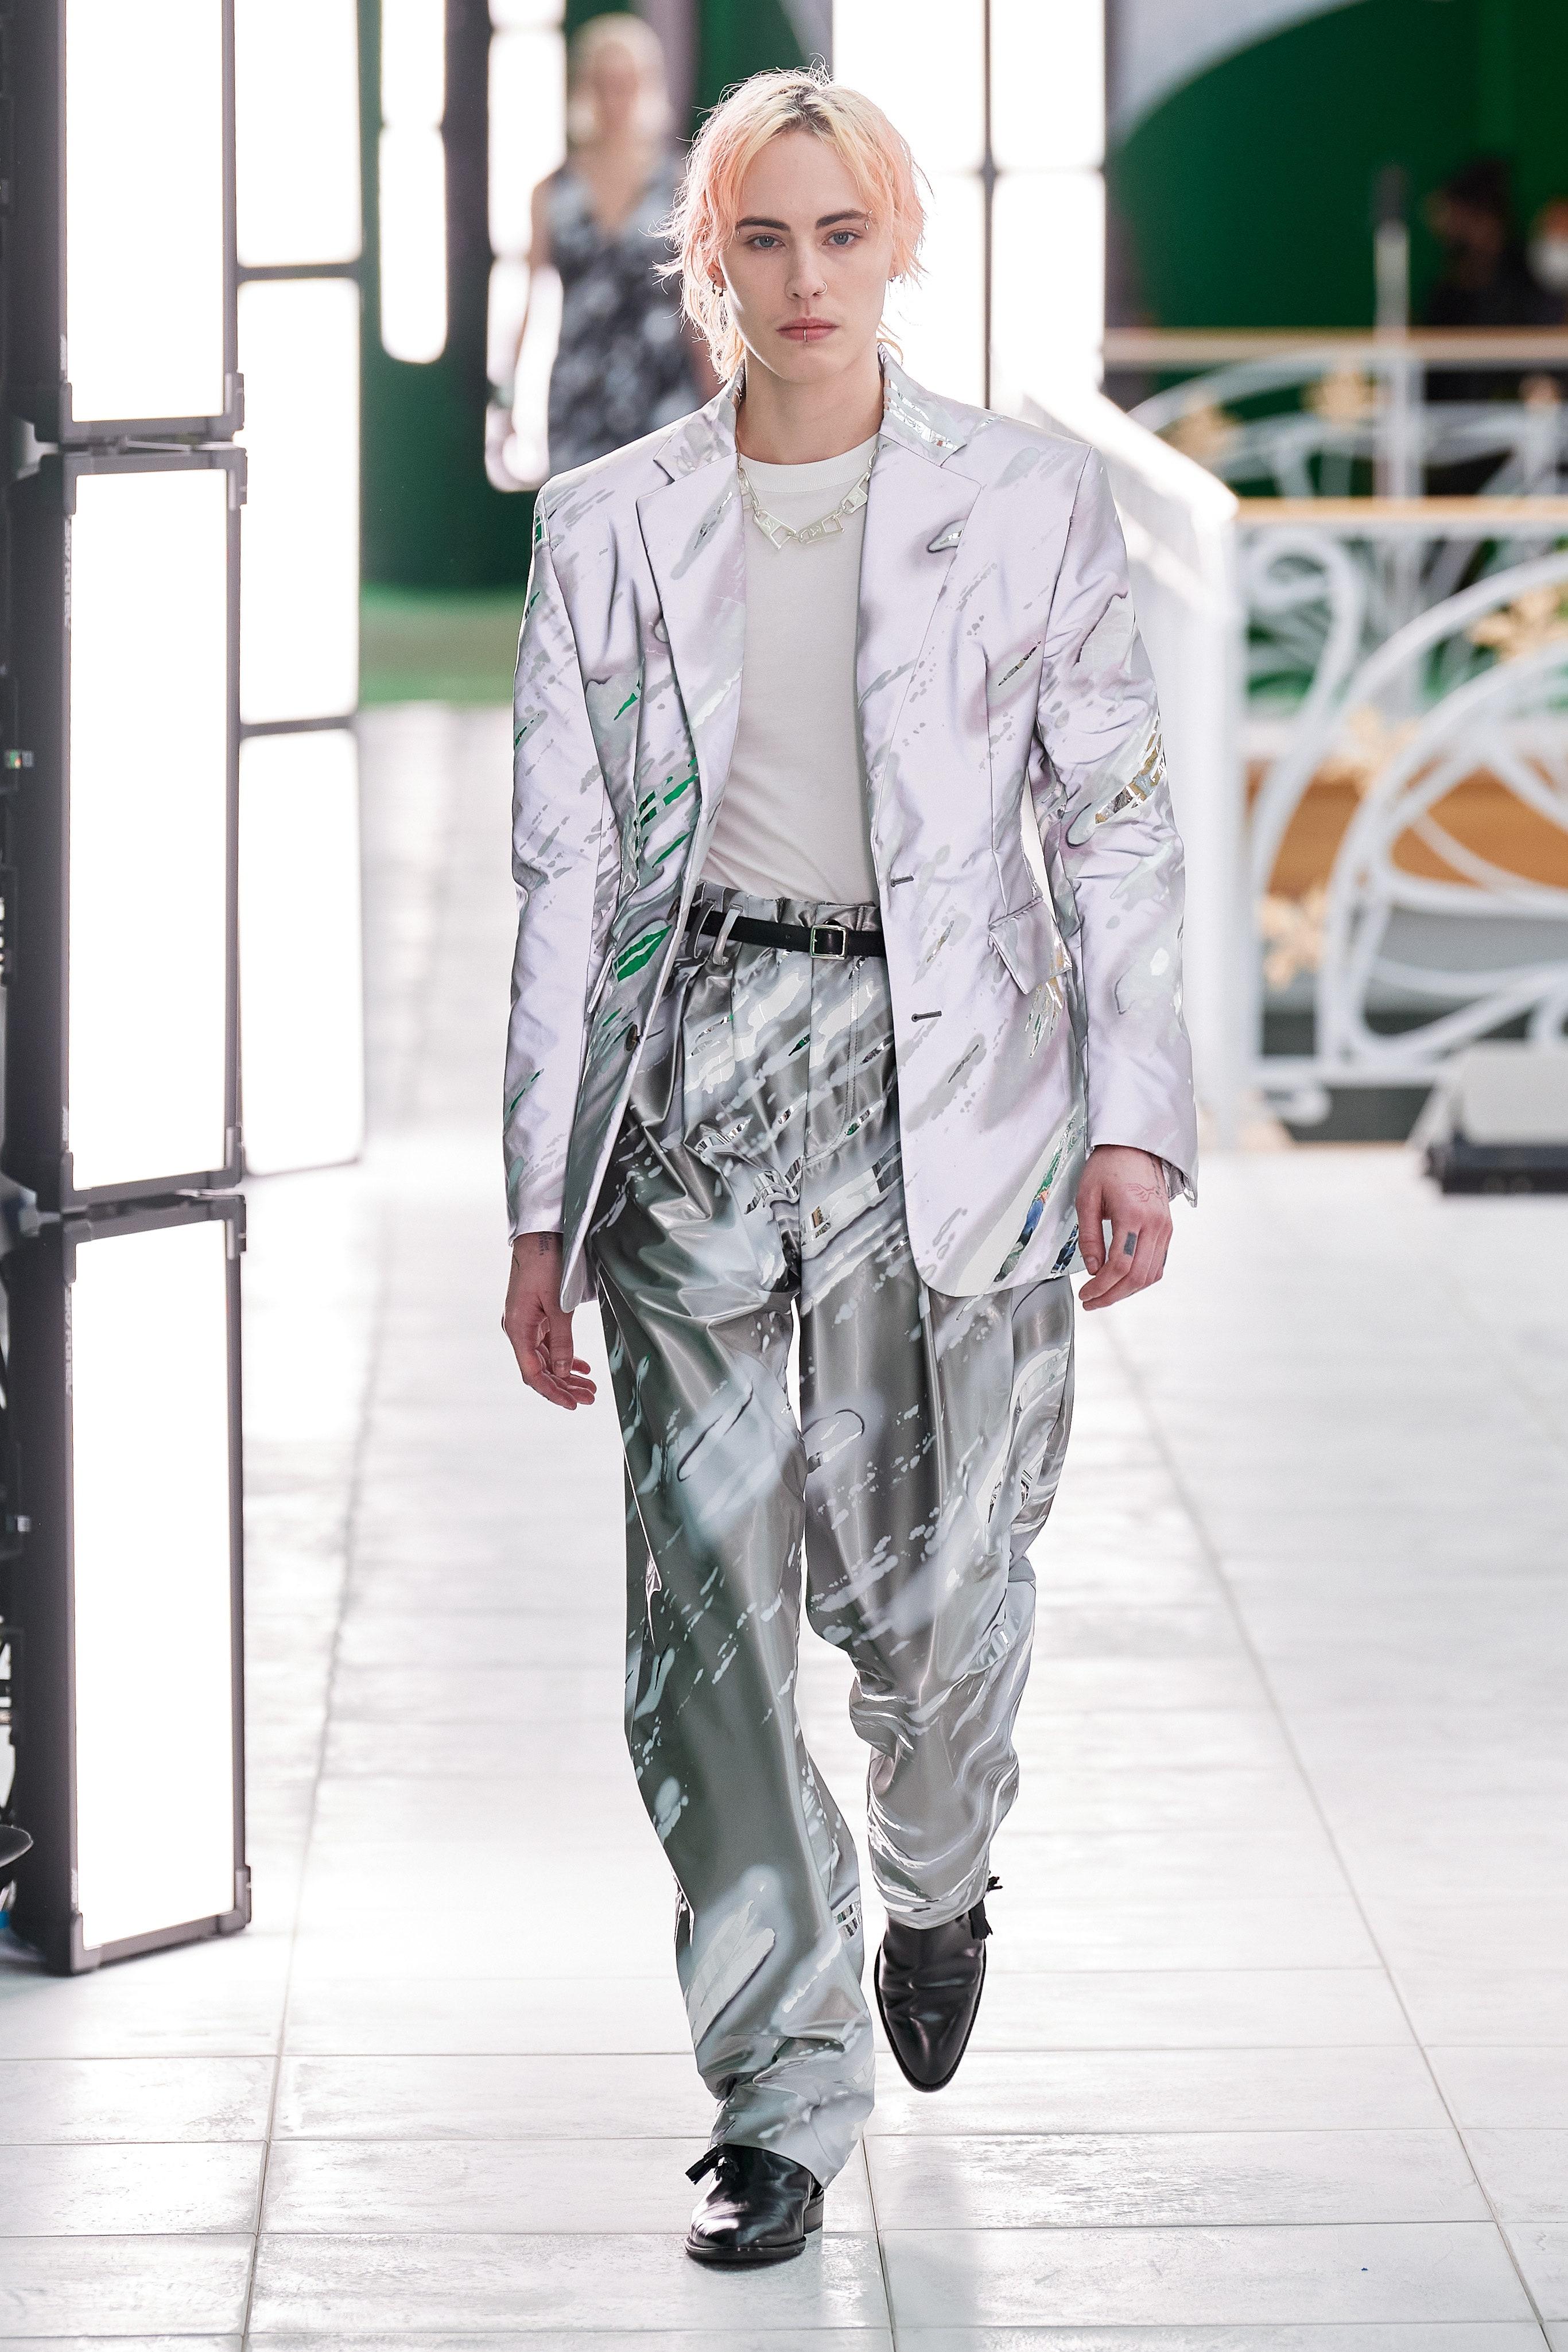 Louis vuitton pfw spring 2021 ready to wear Nicolas Ghesquiere